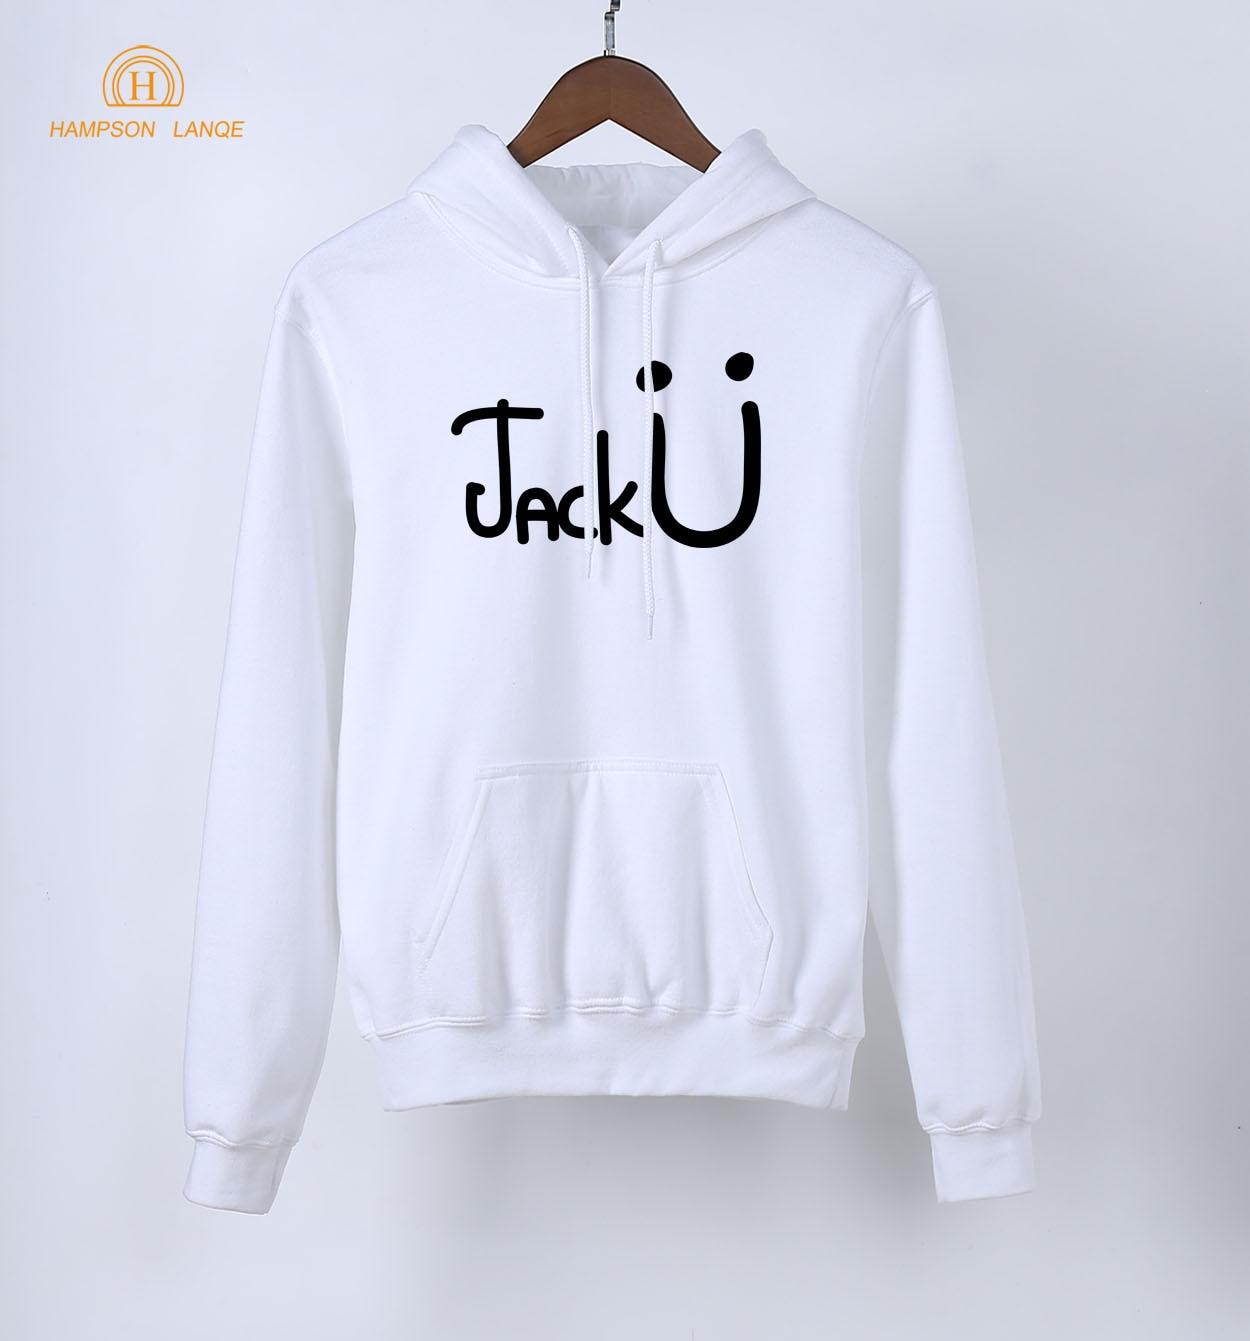 HAMPSON LANQE Famous Band Jack U Fashion Women Hoodies 2018 Spring Autumn Warm Fleece Sweatshirts Hip Hop Hoodie For Fangirl